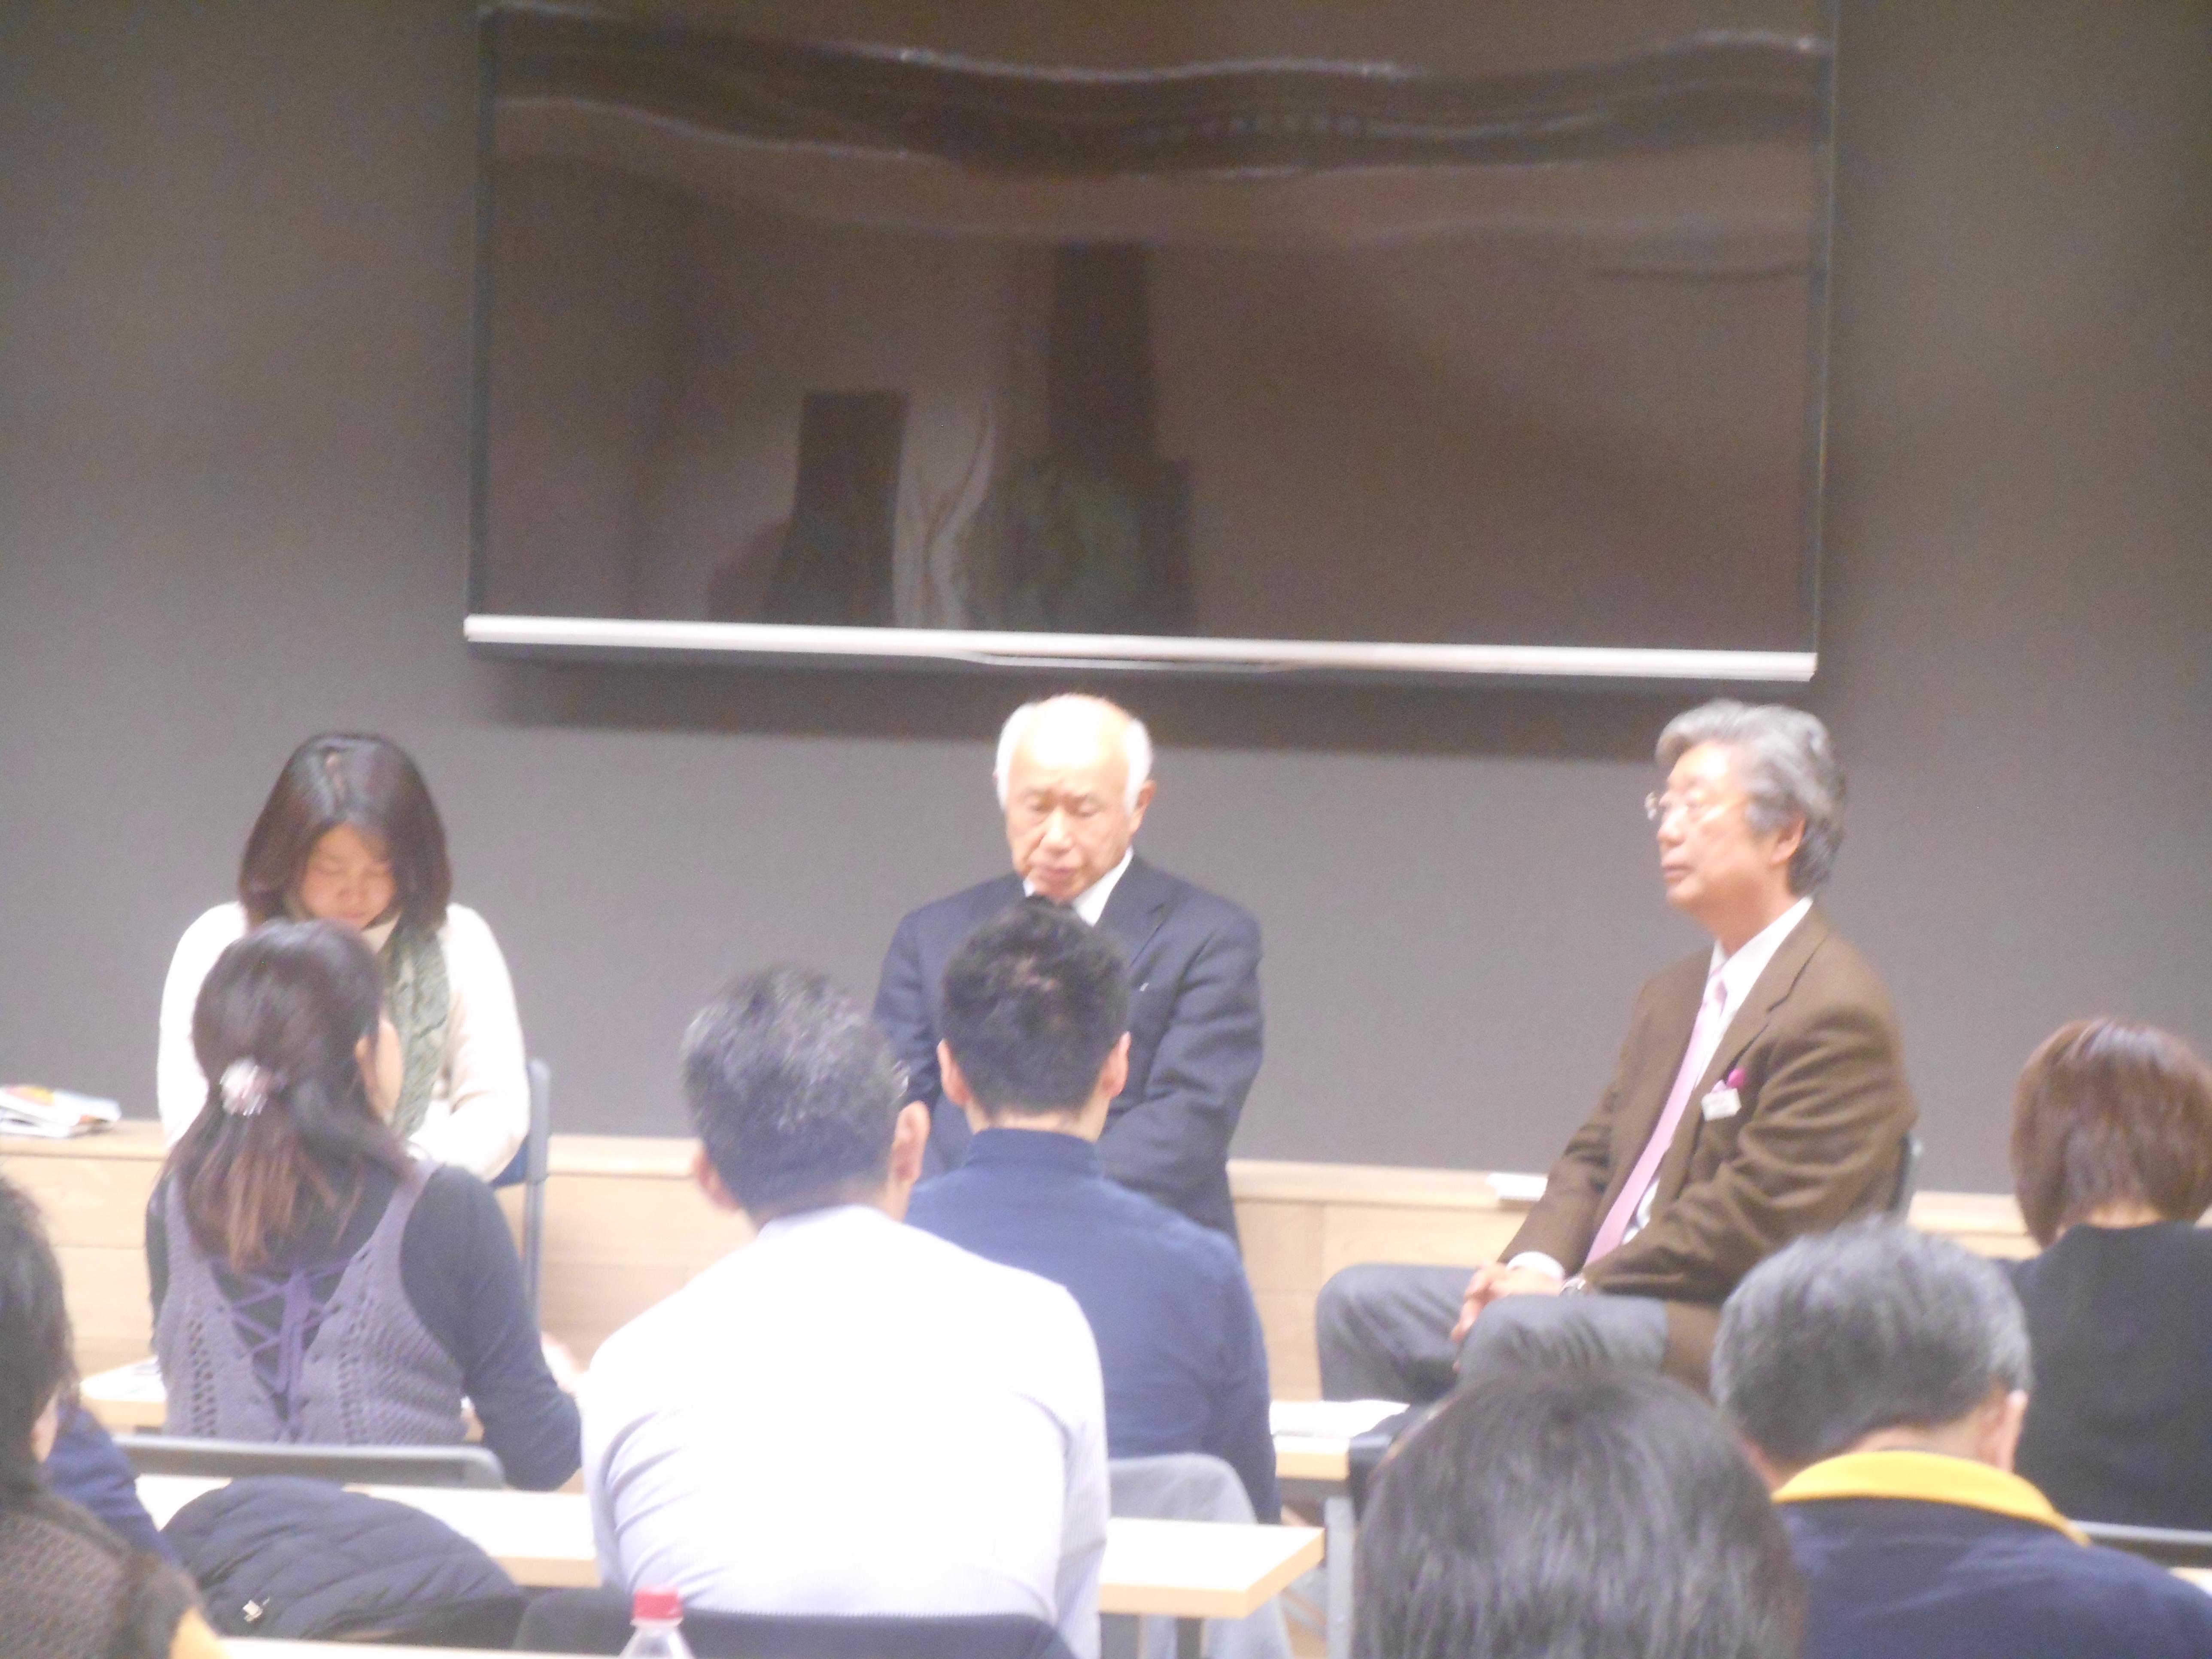 DSCN0507 - 4月1日東京思風塾の開催になります。